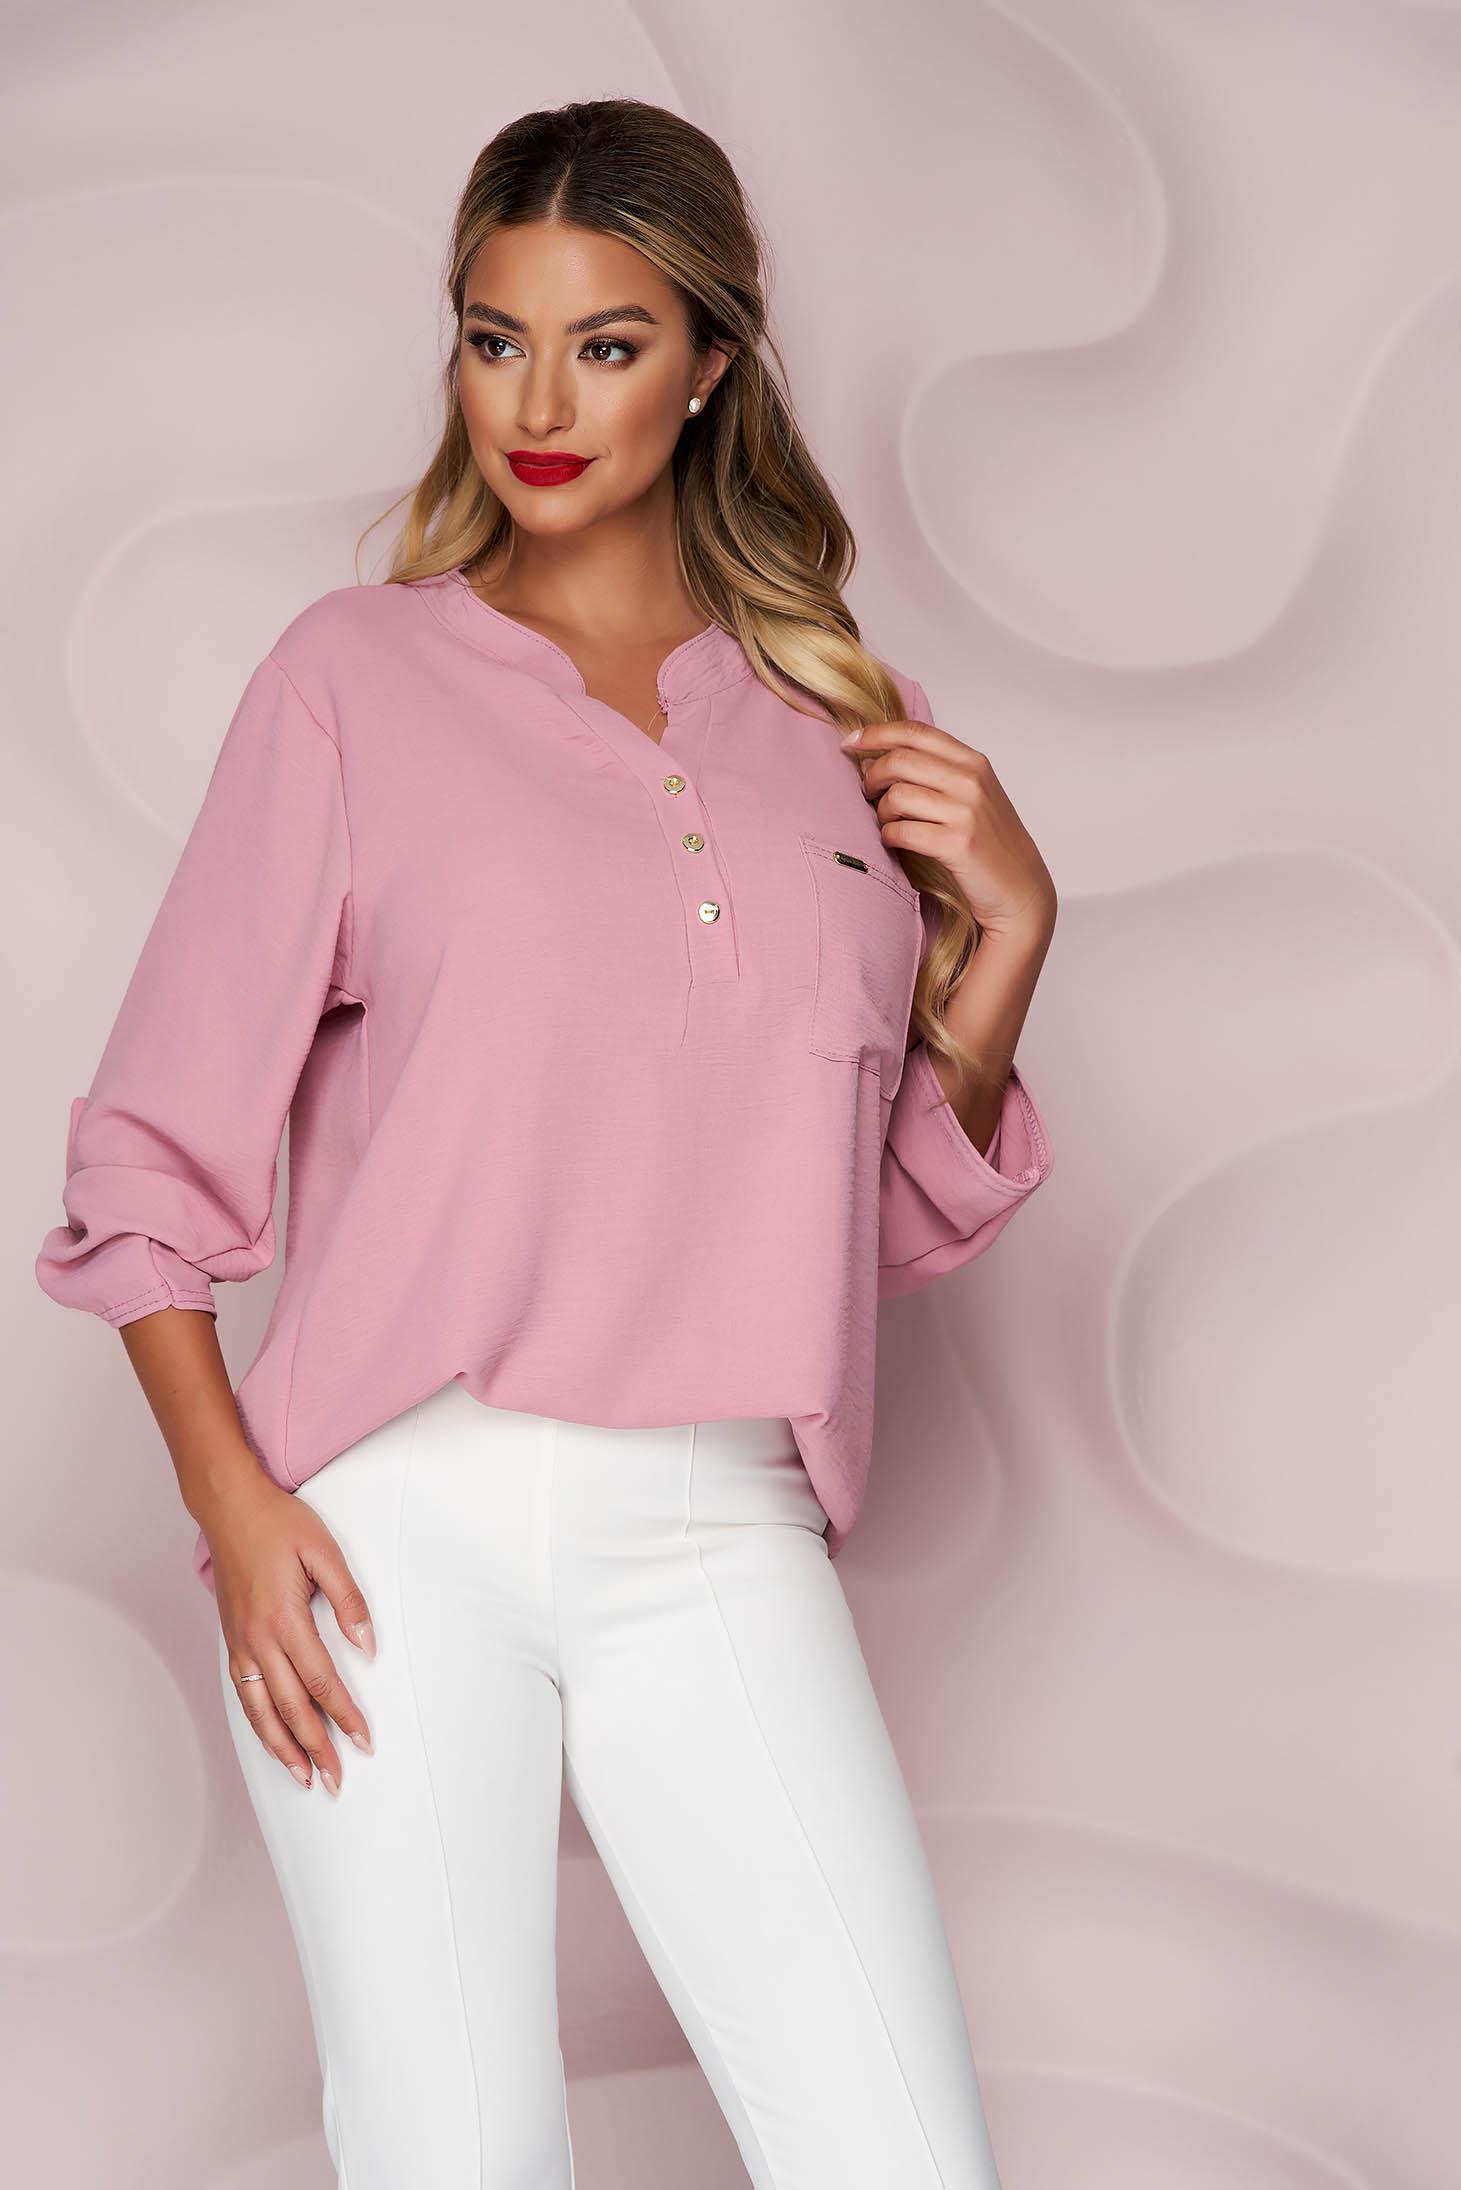 Lightpink women`s blouse loose fit wrinkled material a front pocket